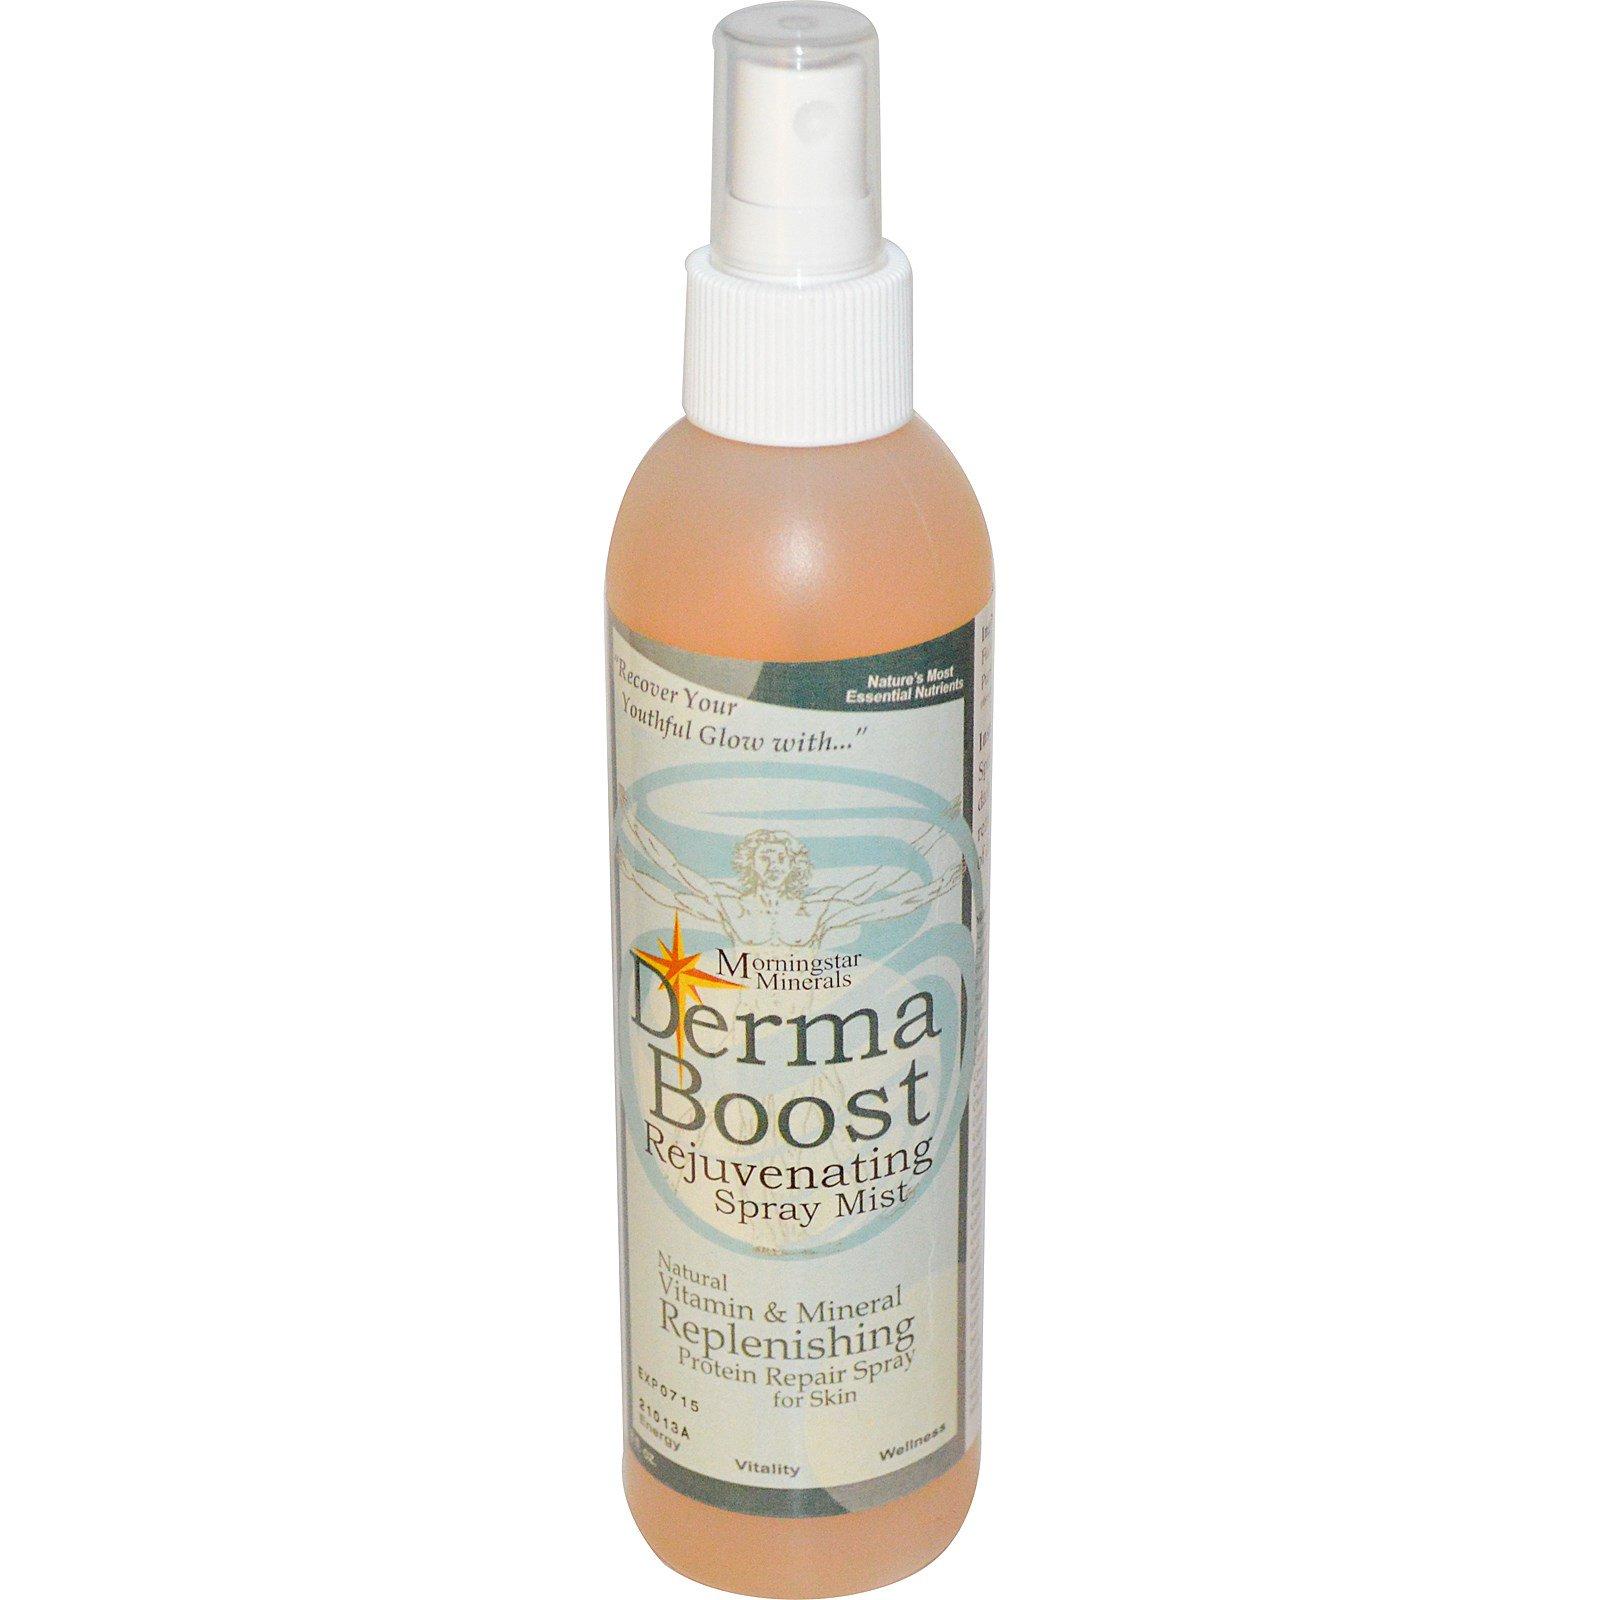 Morningstar Minerals, Энергия кожи, Восстанавливающий спрей, 8 жидких унций